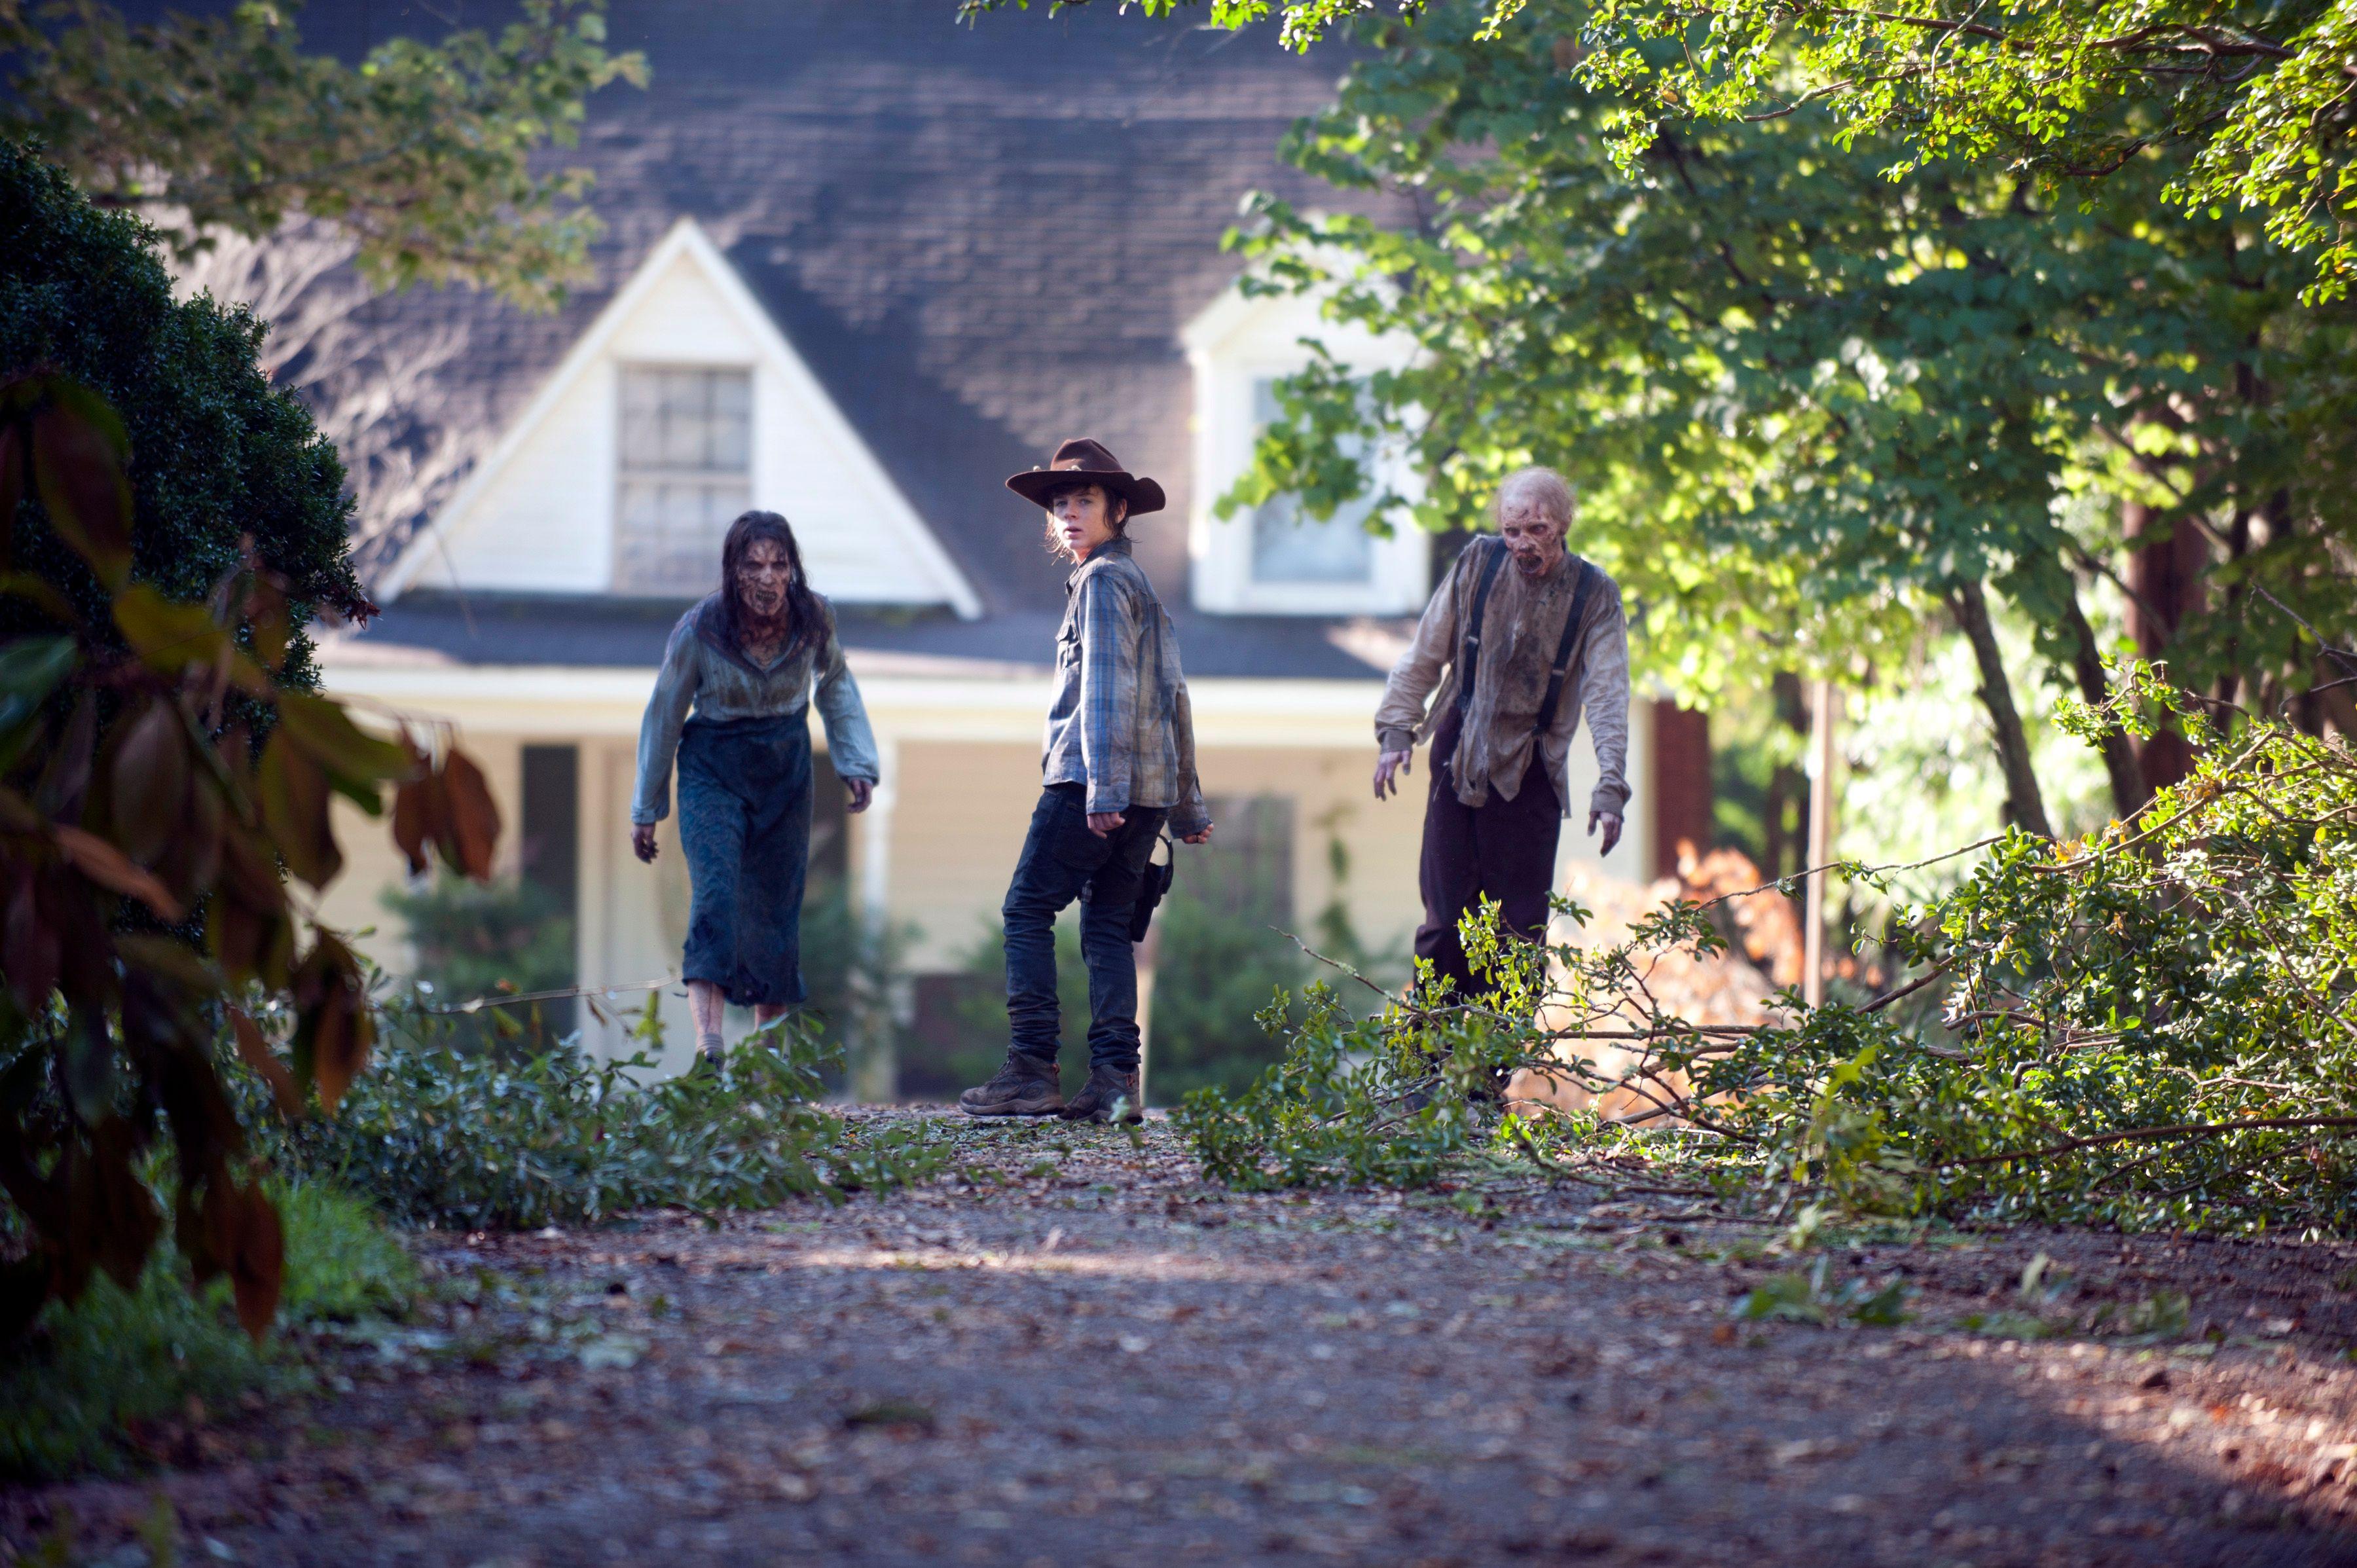 The Walking Dead Season 4 Episode 9 Recap After Collider